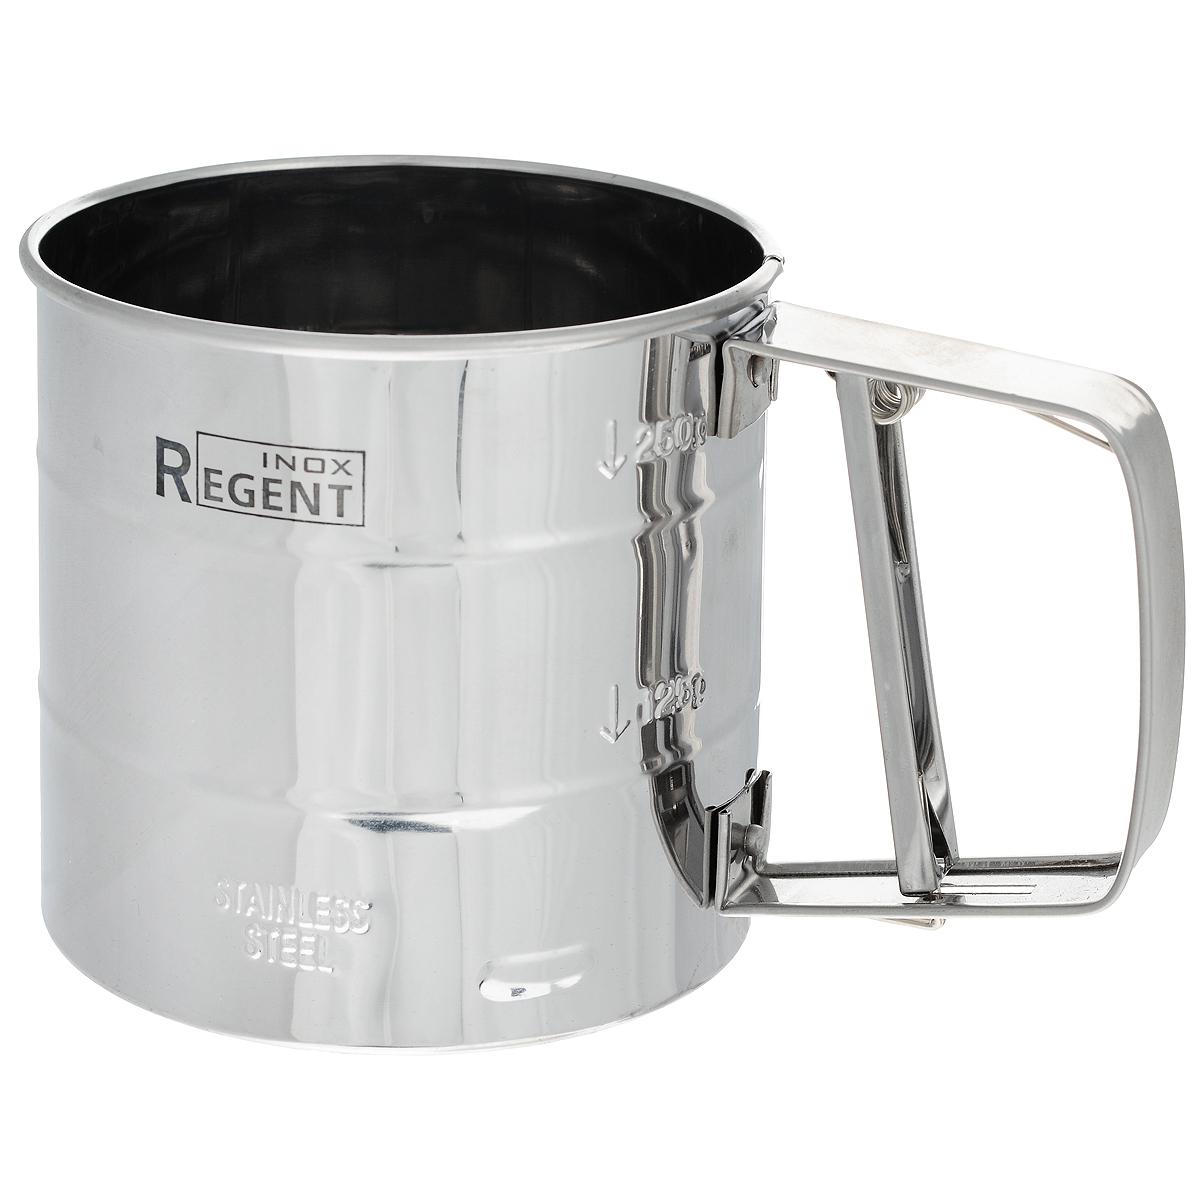 ���� ������������ Regent inox Presto, � ������, ������� 10 �� - Regent Inox93-AC-PR-04.1������������ ���� Regent Inox Presto ��������� �� ������������������ ����������� ����� � ���������� ����������. ���� ������������� ��� ����������� ����, ��������� ����� � ������ ������� ���������. ������������ ������� ������ ������� ����������� ������� �����. ��� ����� �� ����� ������� ����������� �����, ��� ������� �� ������� ����������� �������� (��������, ����������� ������ �������� ���������). ���� ����� ������.